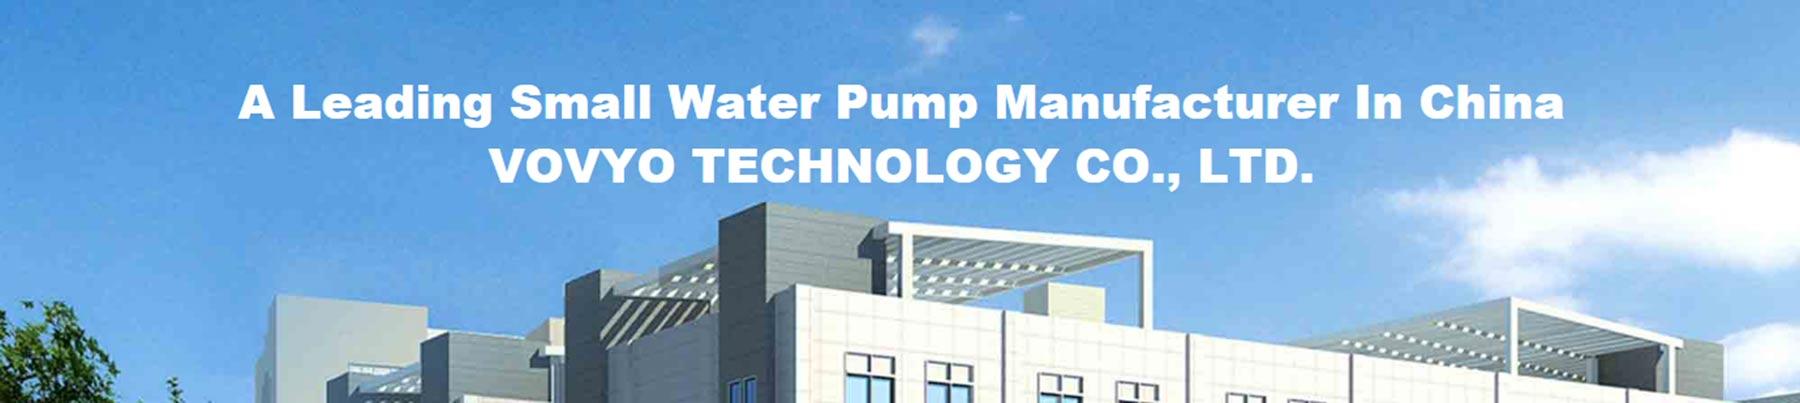 small water pump manufacturer